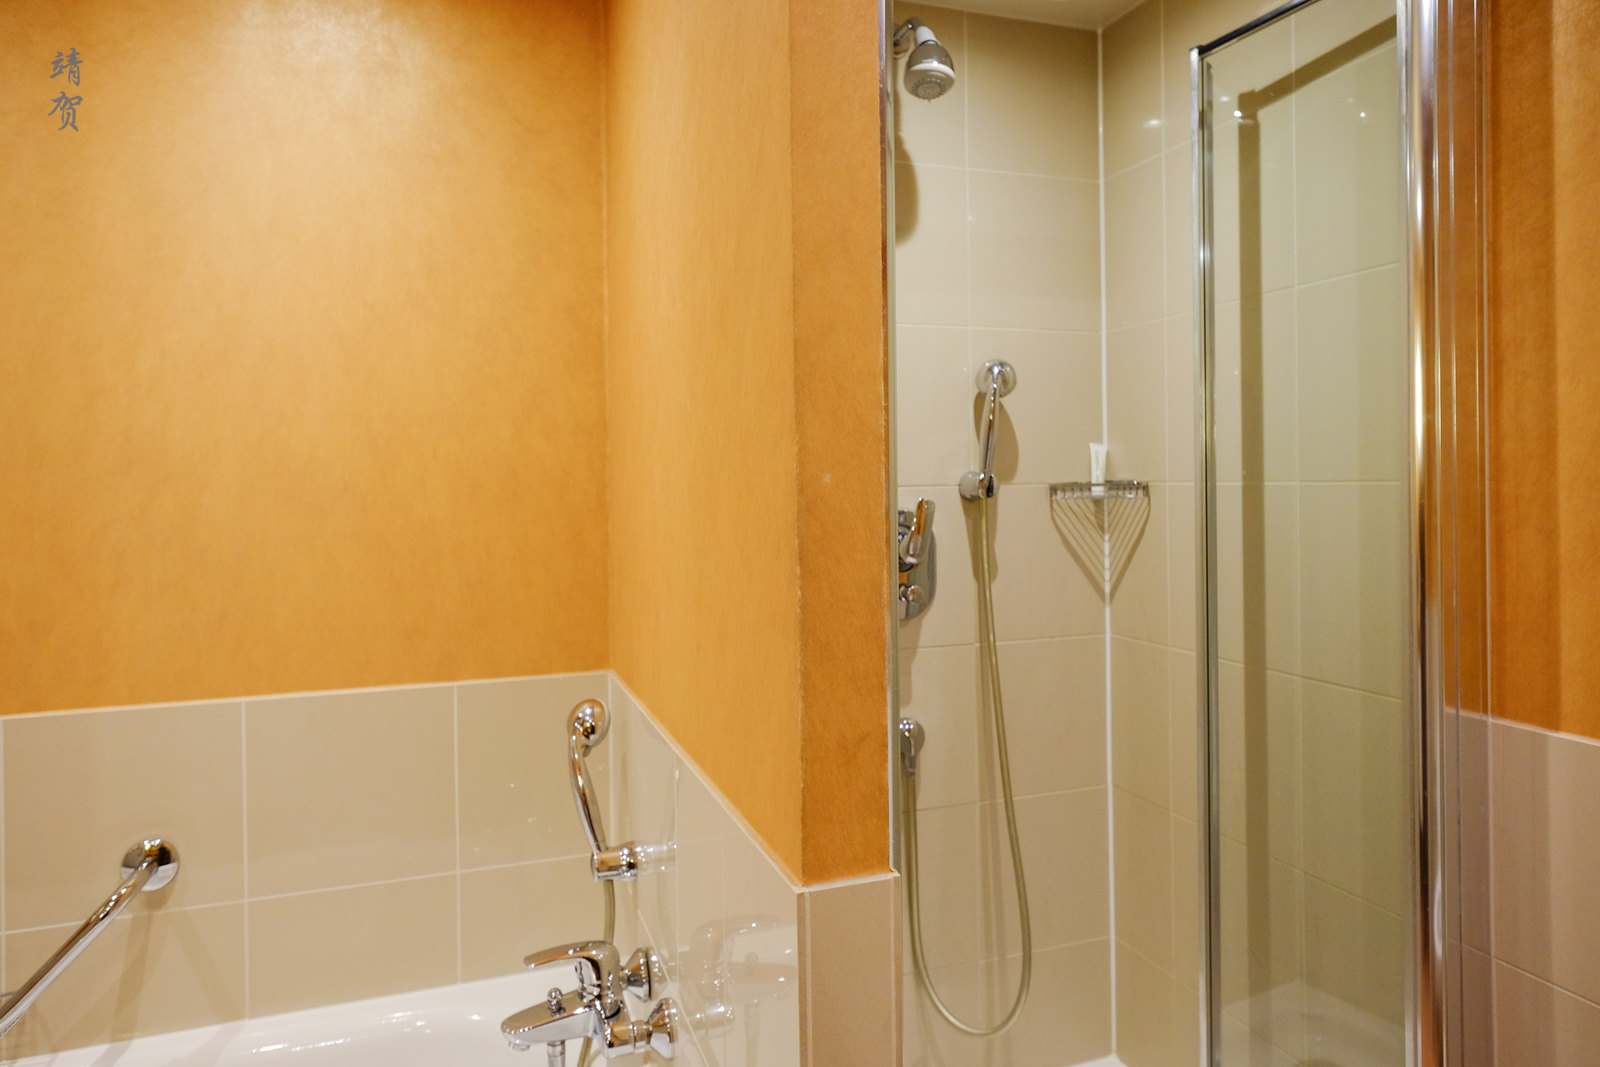 Shower chamber